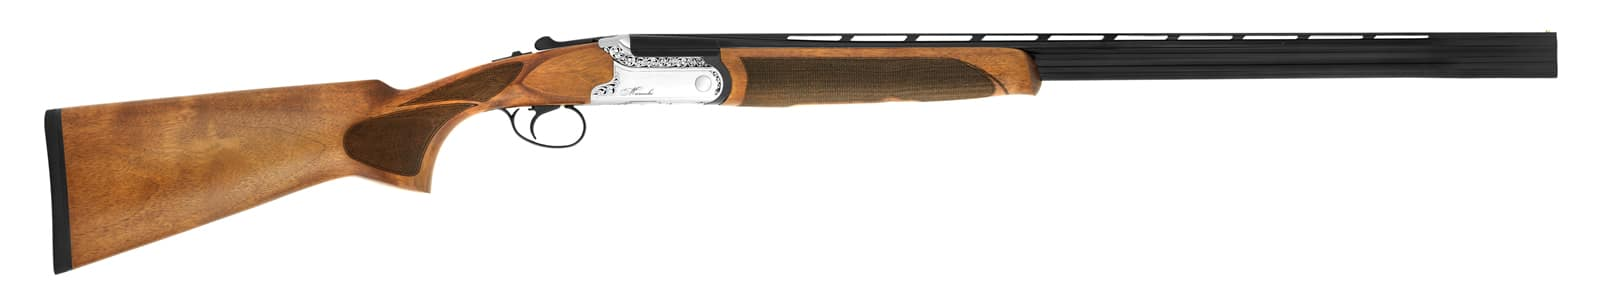 Fusil superposé MAROCCHI FIRST LUXE Cal. 28/70